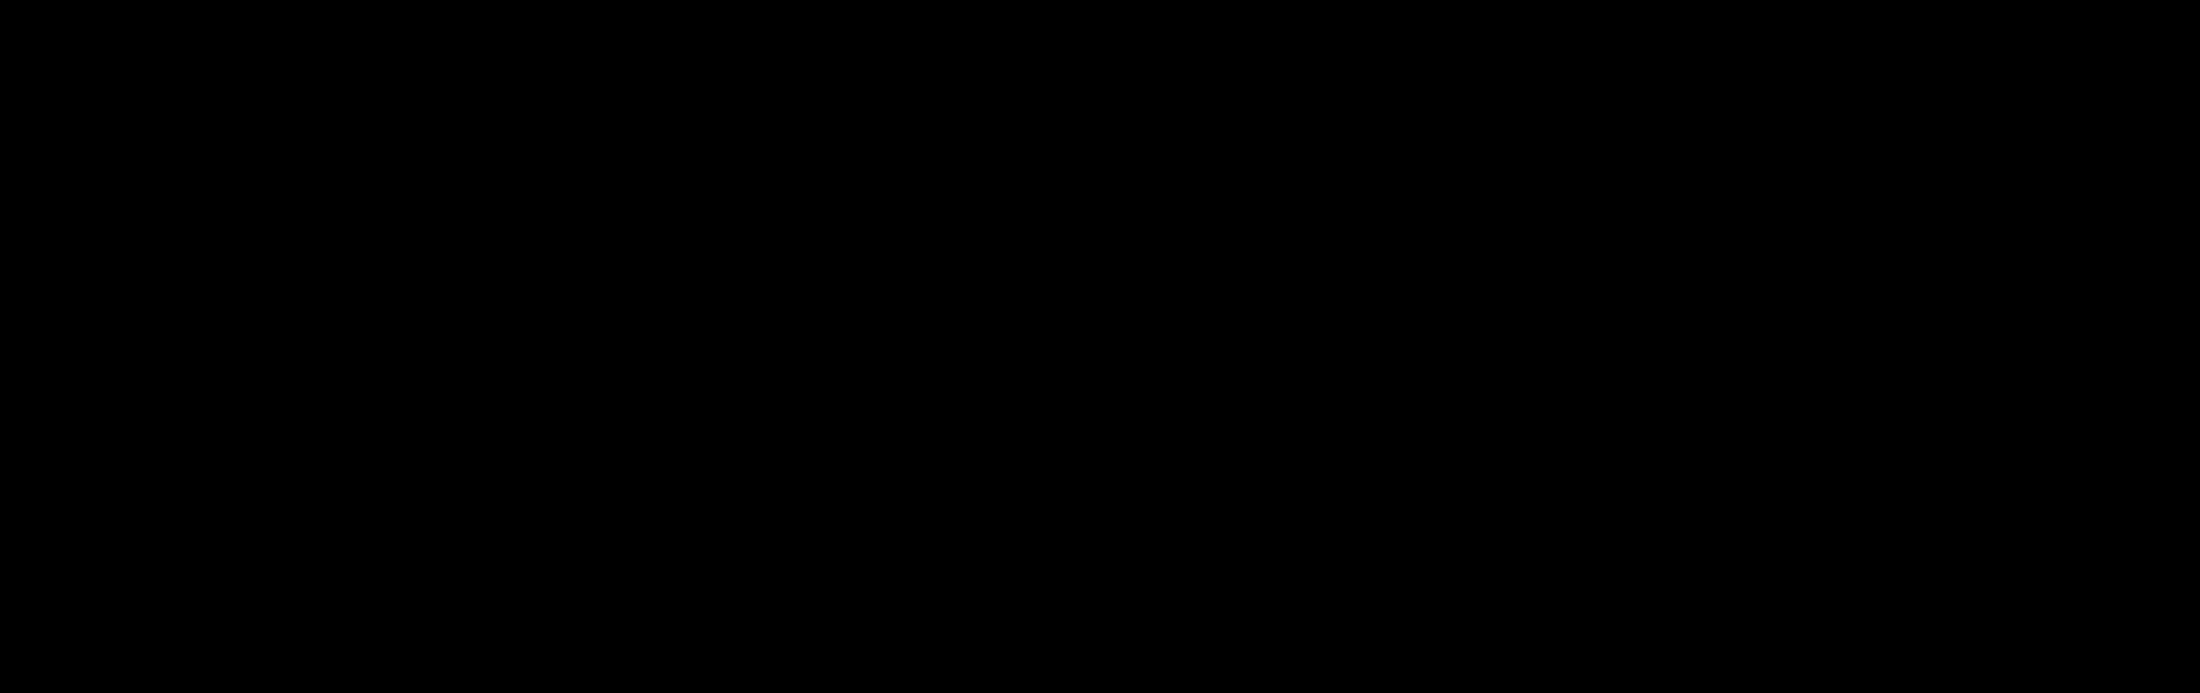 https://i2.wp.com/reneeroaming.com/wp-content/uploads/2018/01/Logo-Travel-and-Leisure.png?ssl=1